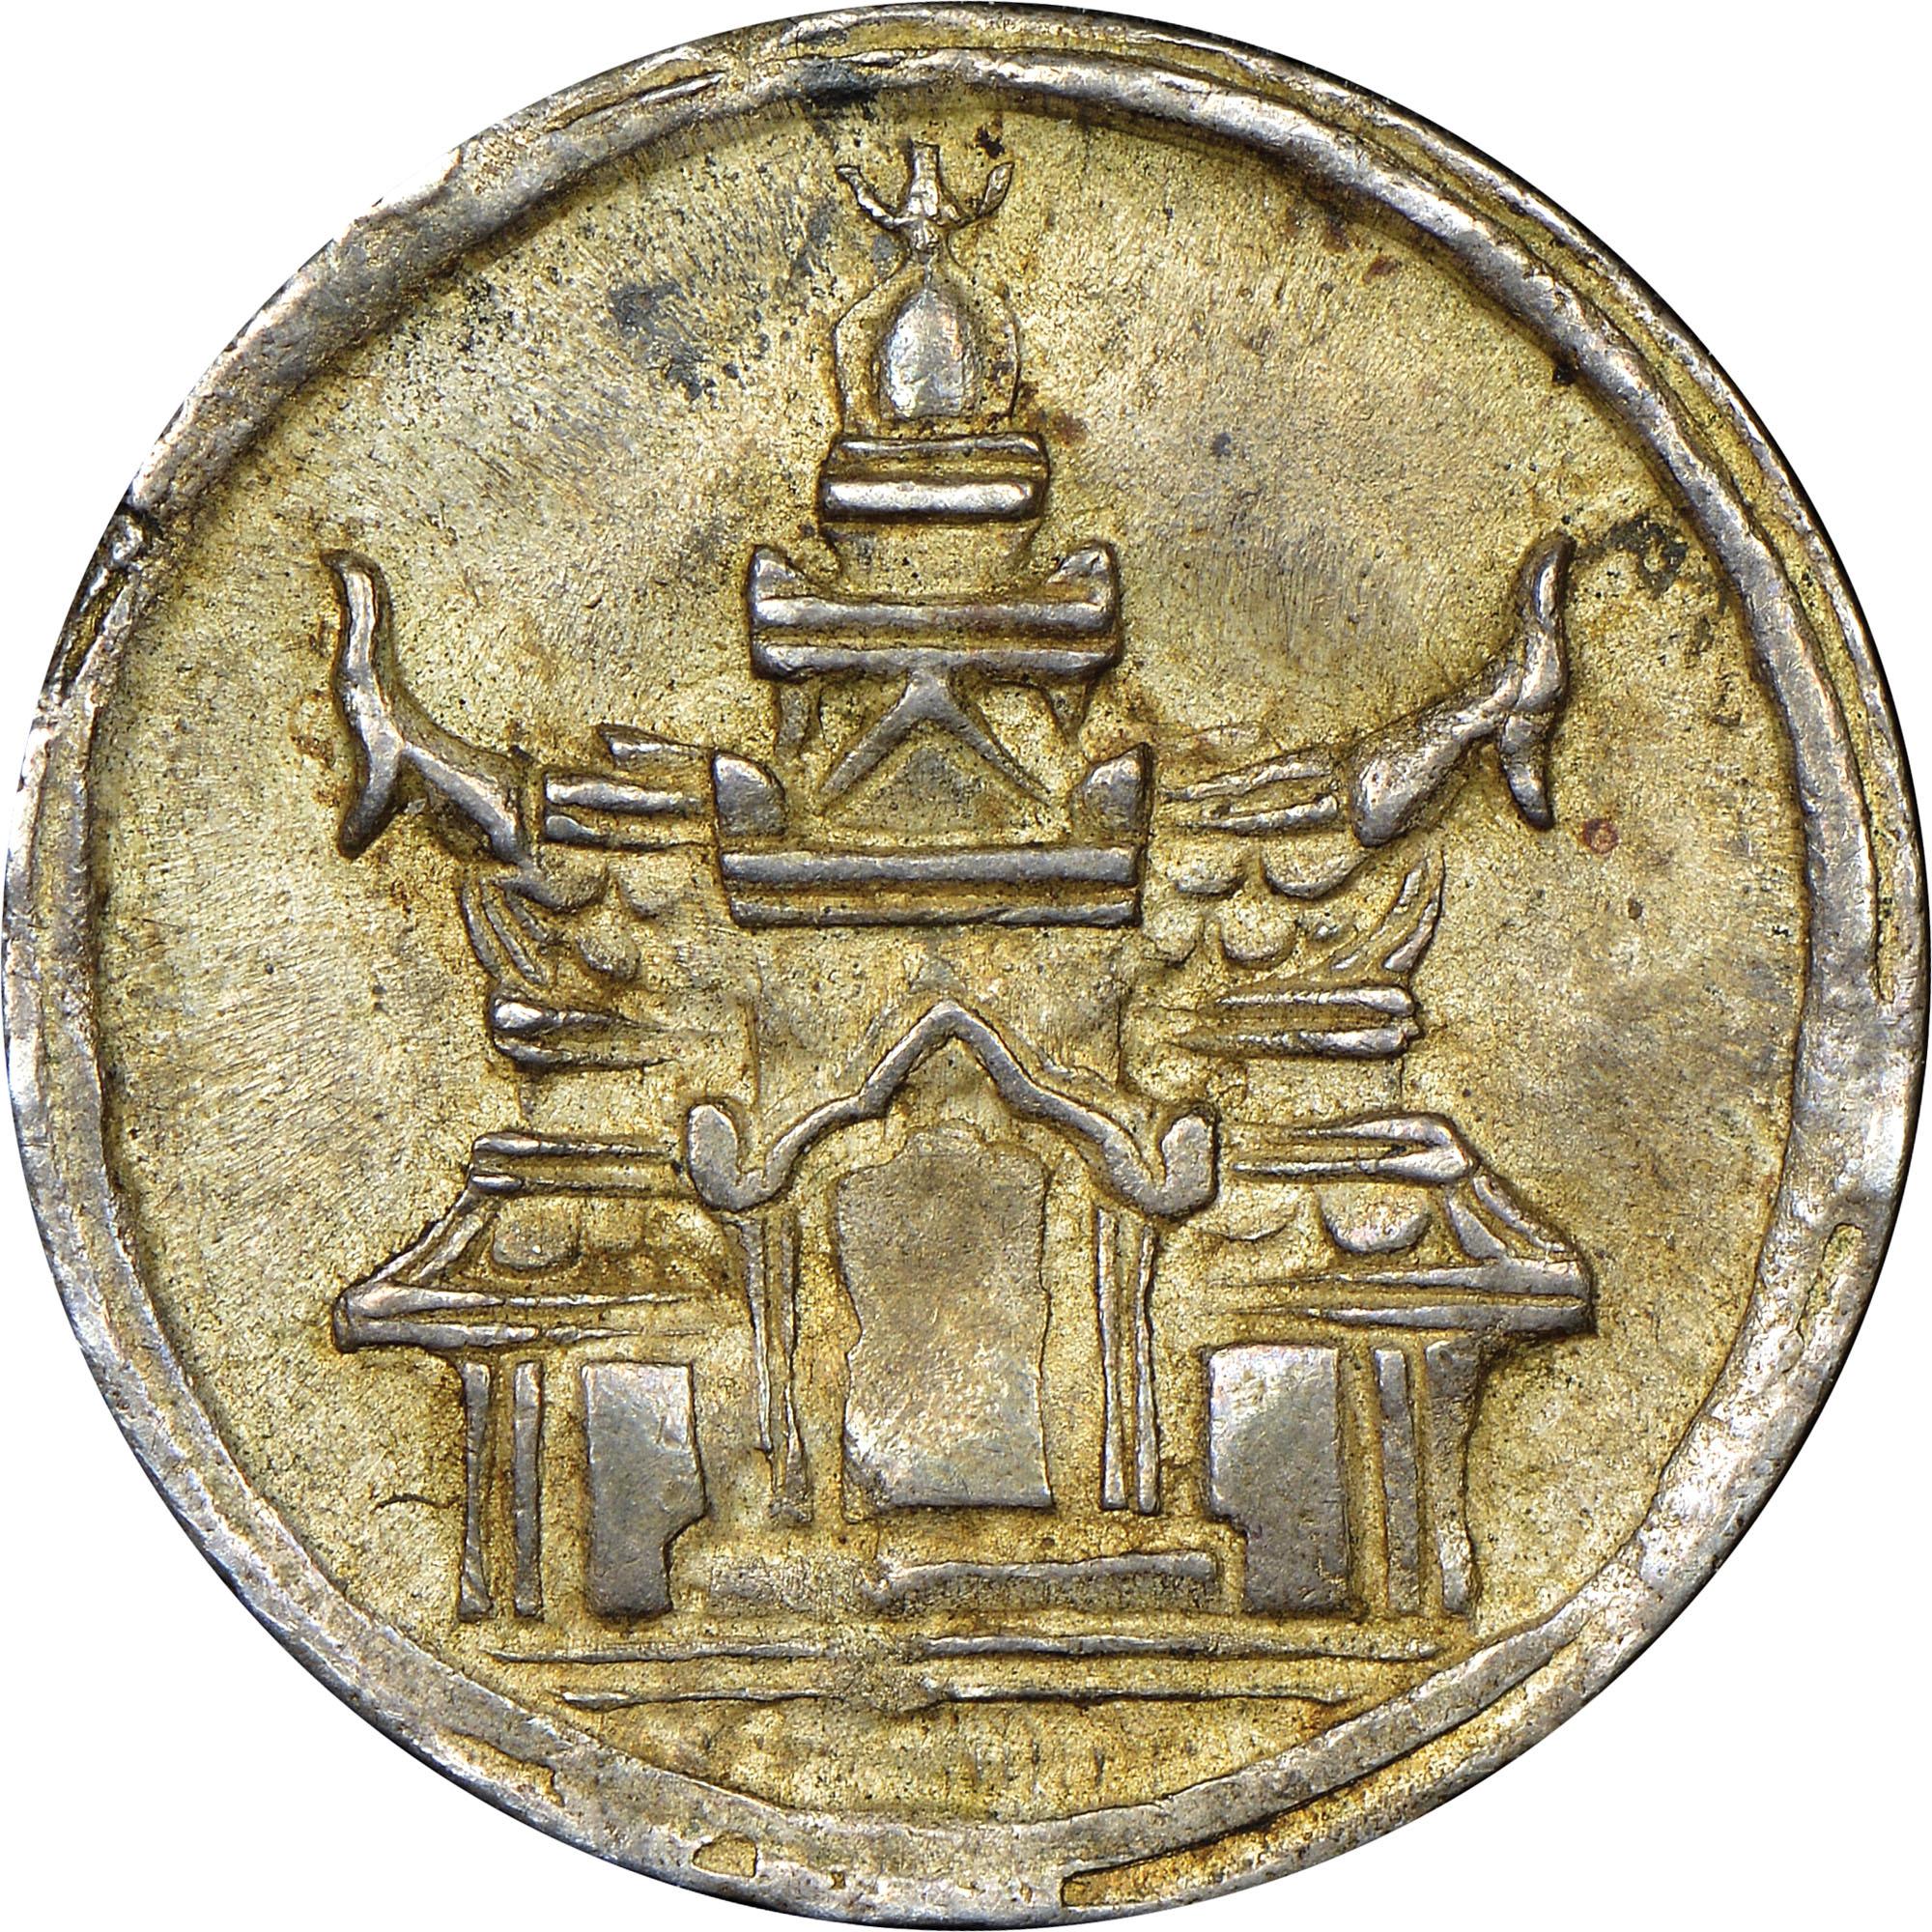 1208 (1847) Cambodia 1/4 Tical, 1 Salong reverse